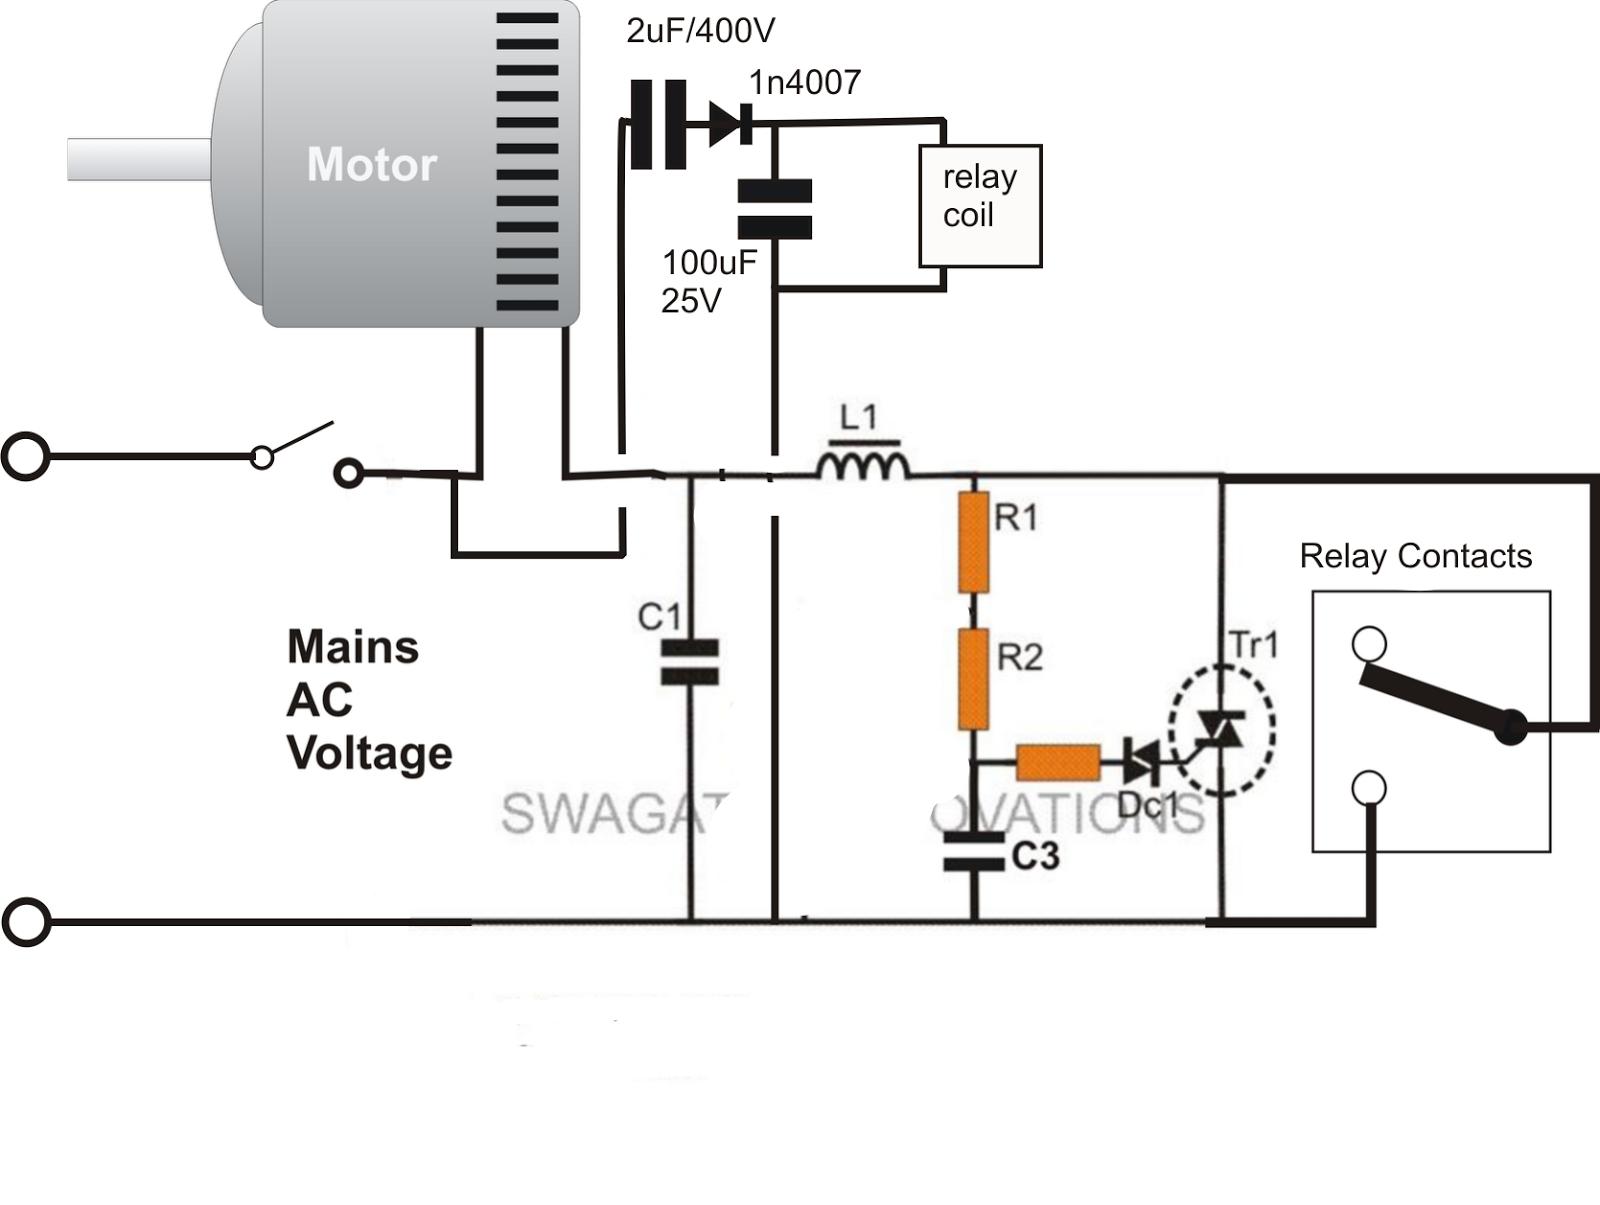 Pump Motor Wiring Diagram In Addition Motor Capacitor Wiring Diagrams